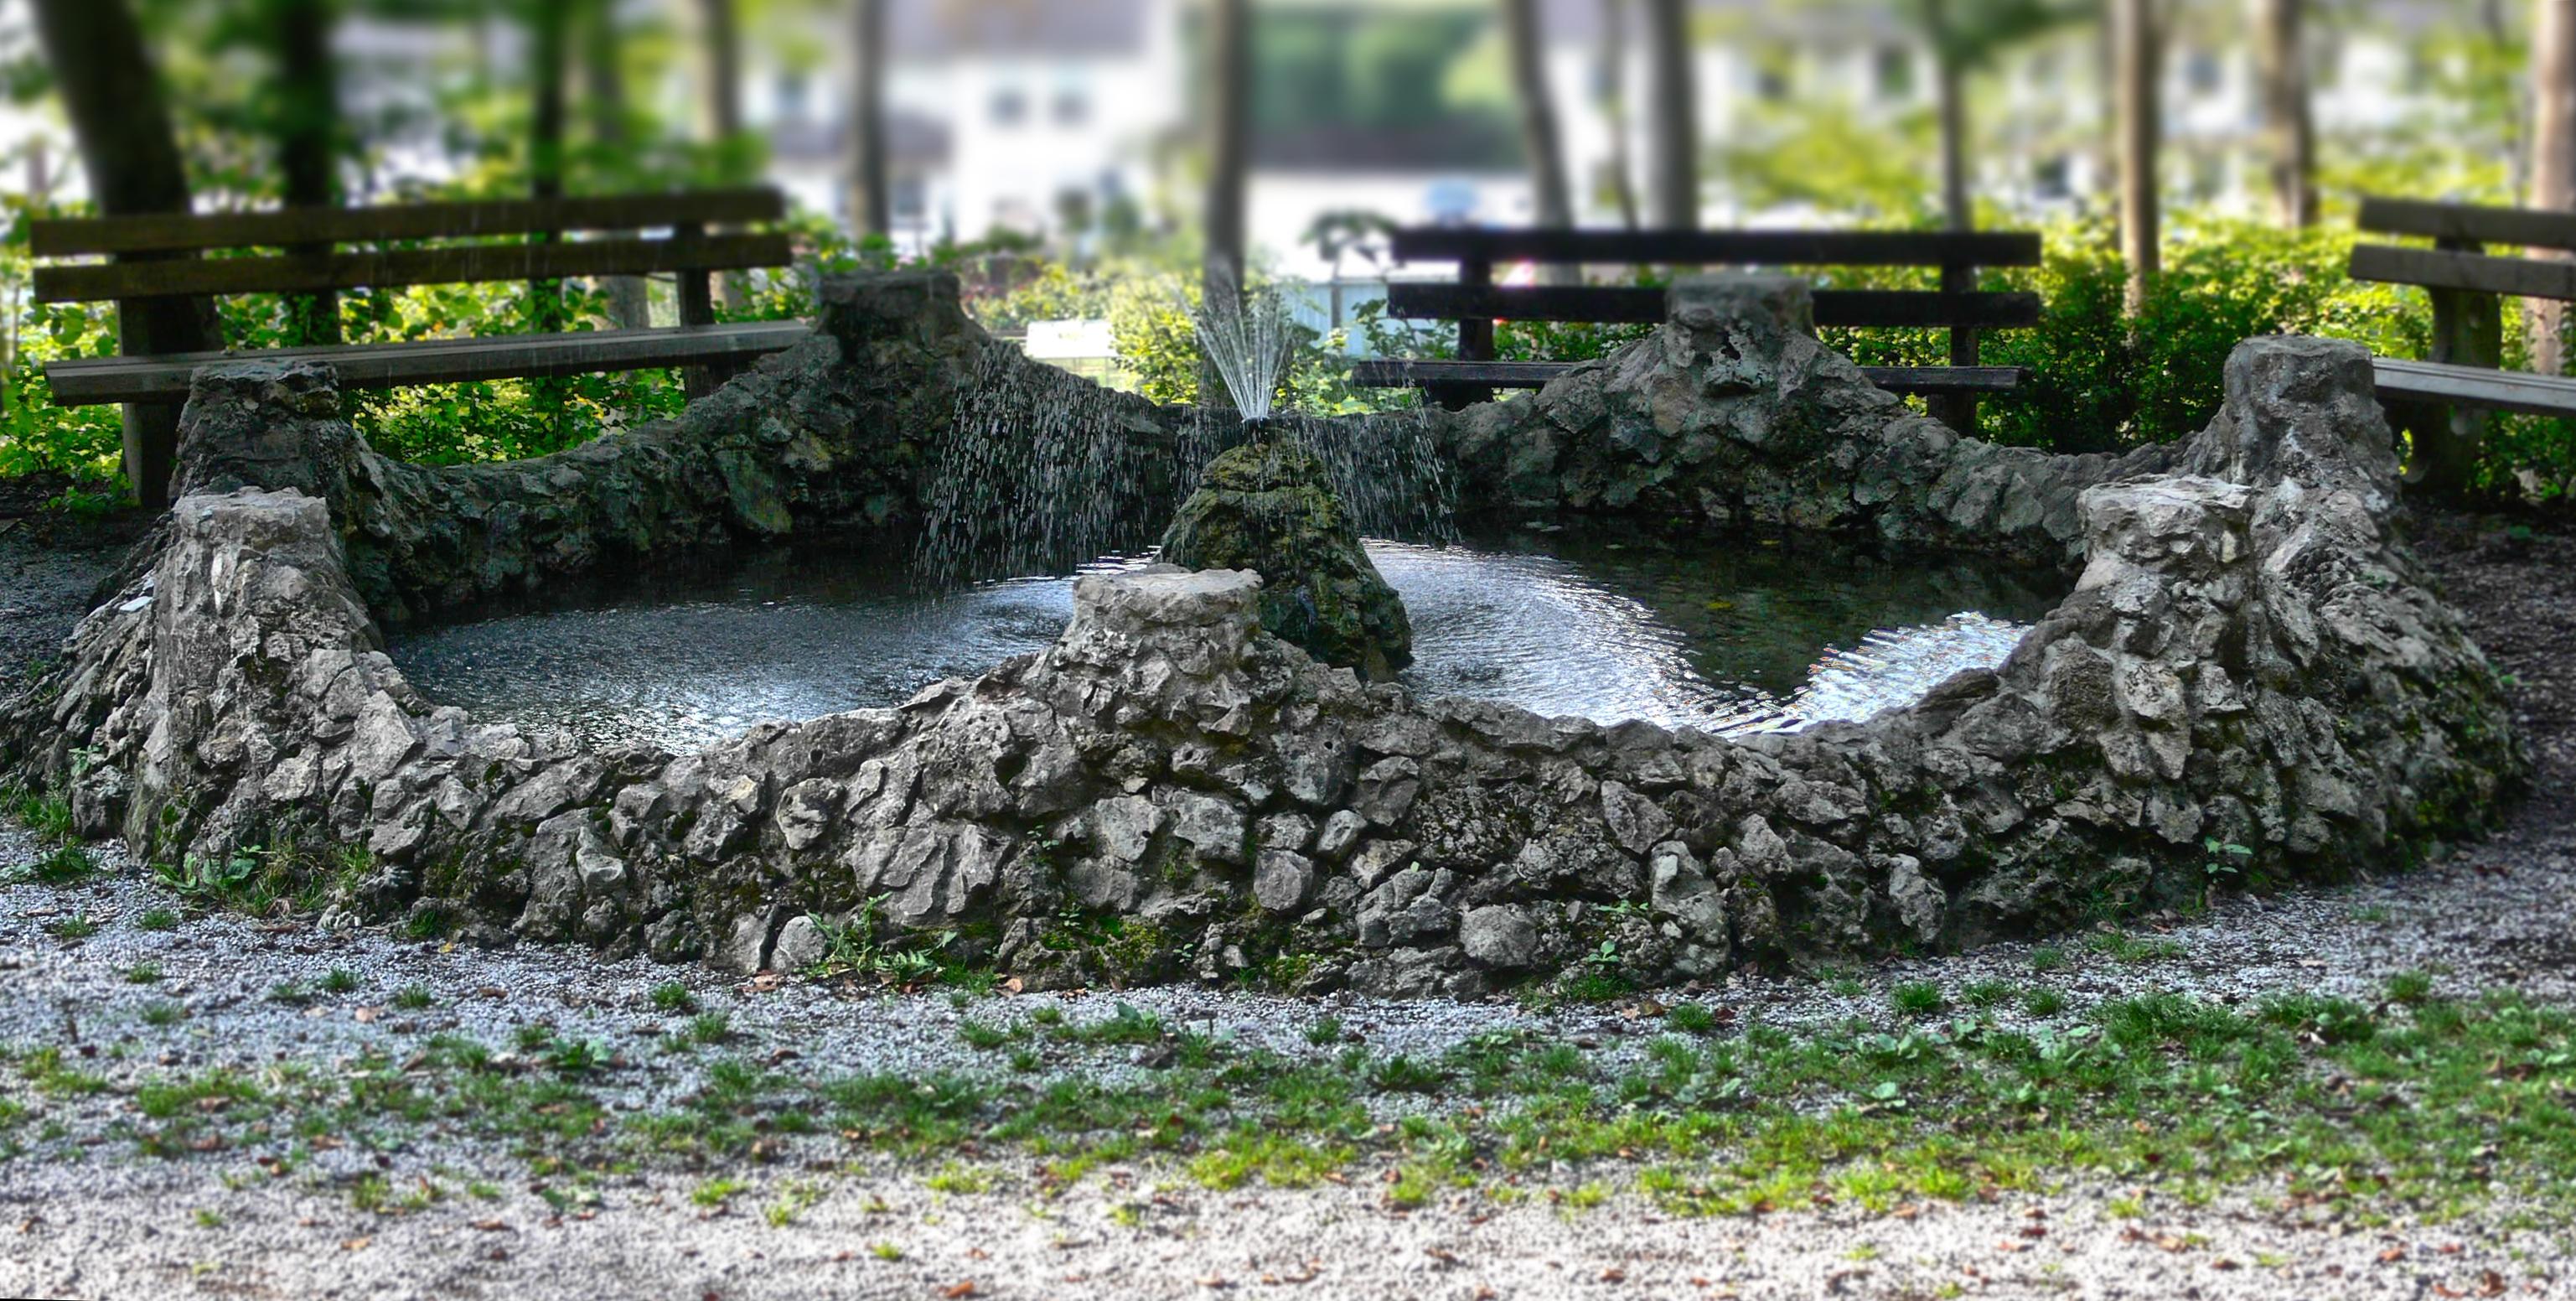 Fotos gratis rbol agua naturaleza bosque csped antiguo